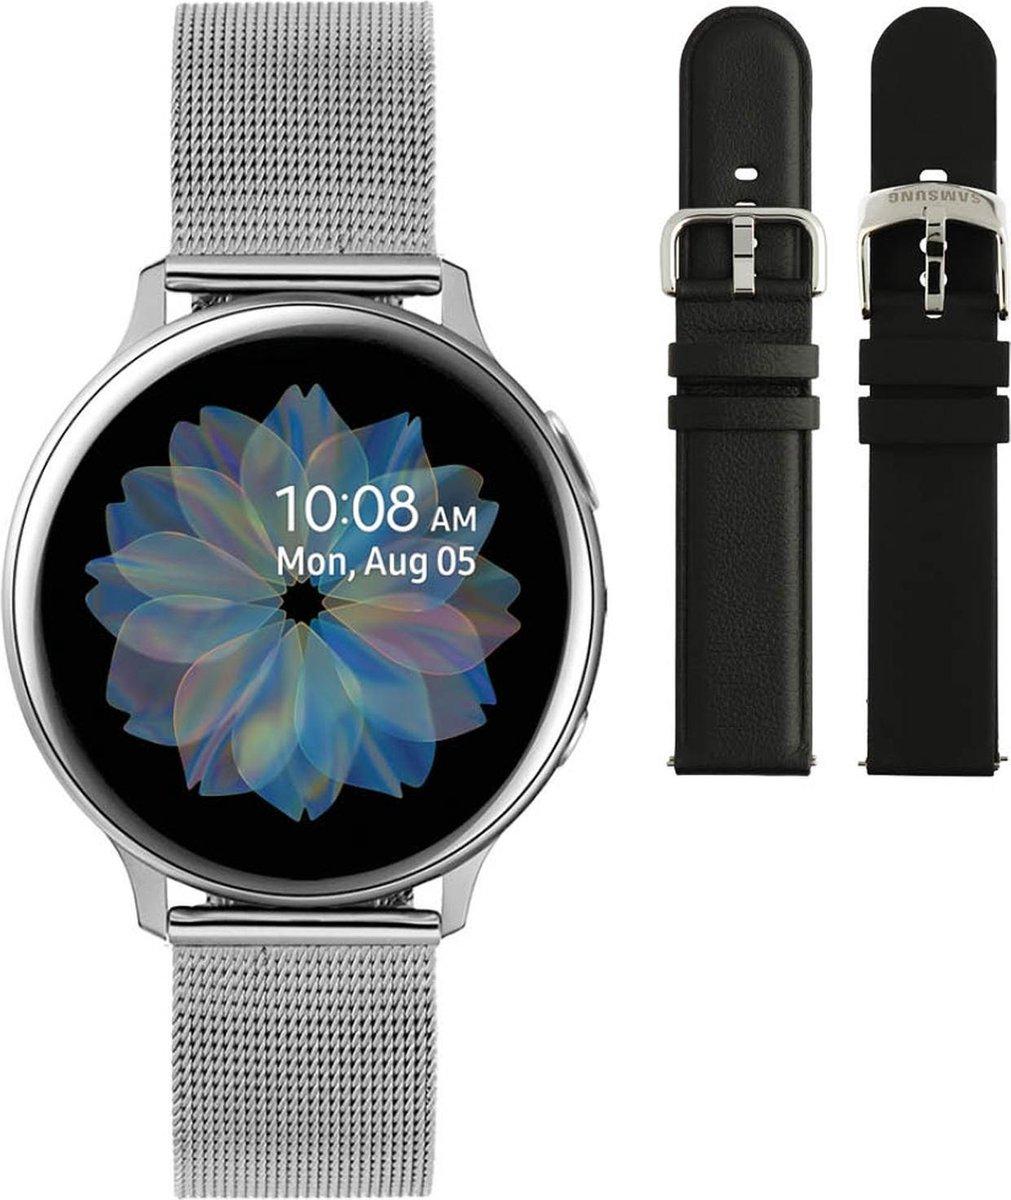 Samsung Active2 smartwatch SA.R830SM - Staal - Milanese band - Zilverkleurig - Ø 40 mm - Special edition kopen